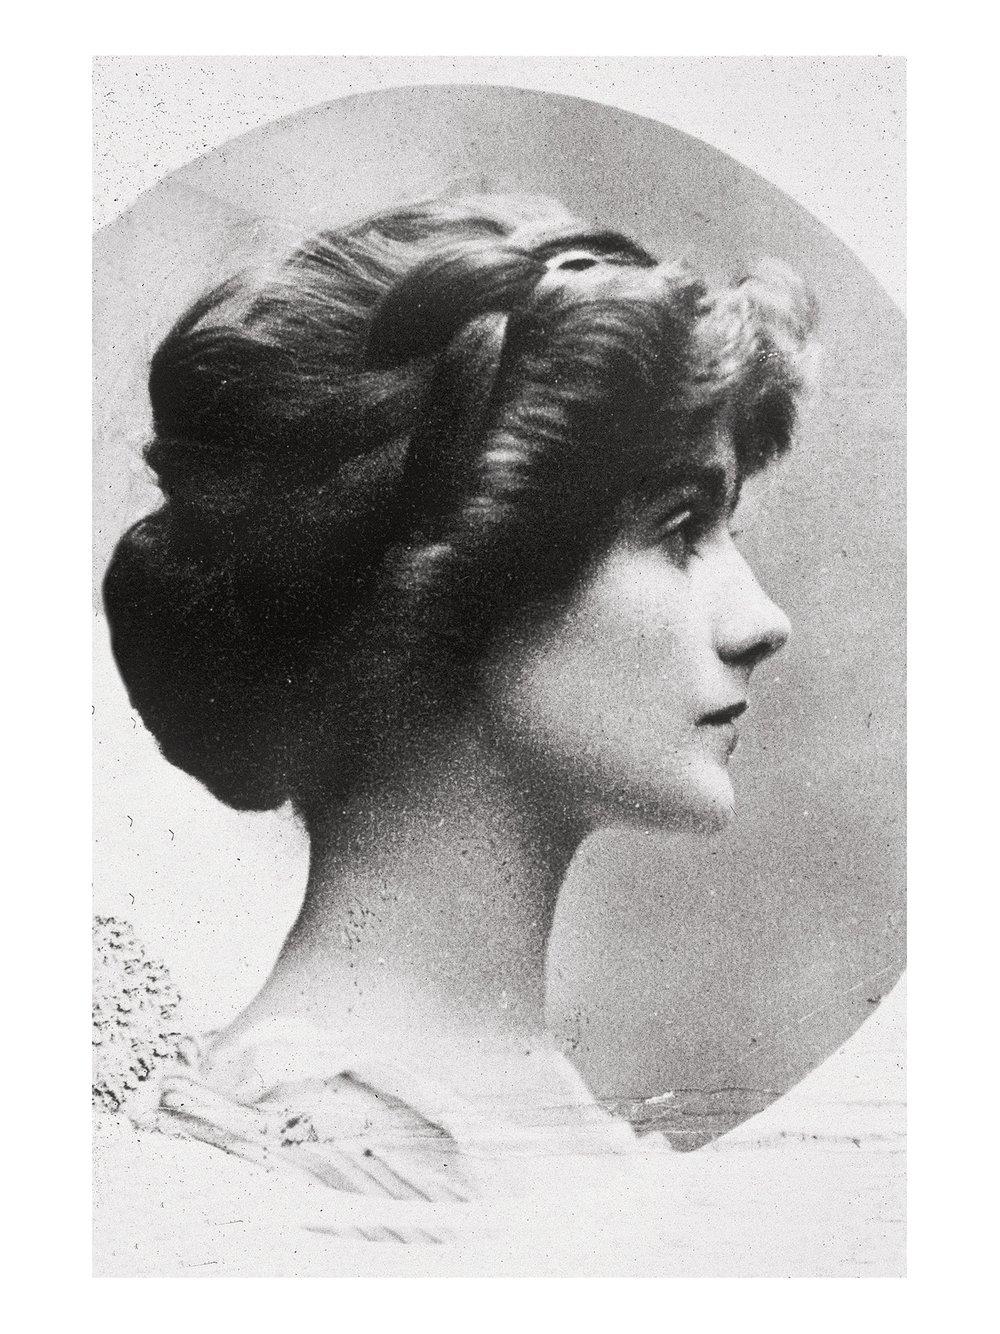 1909_chanel_cheveux_longs.jpg